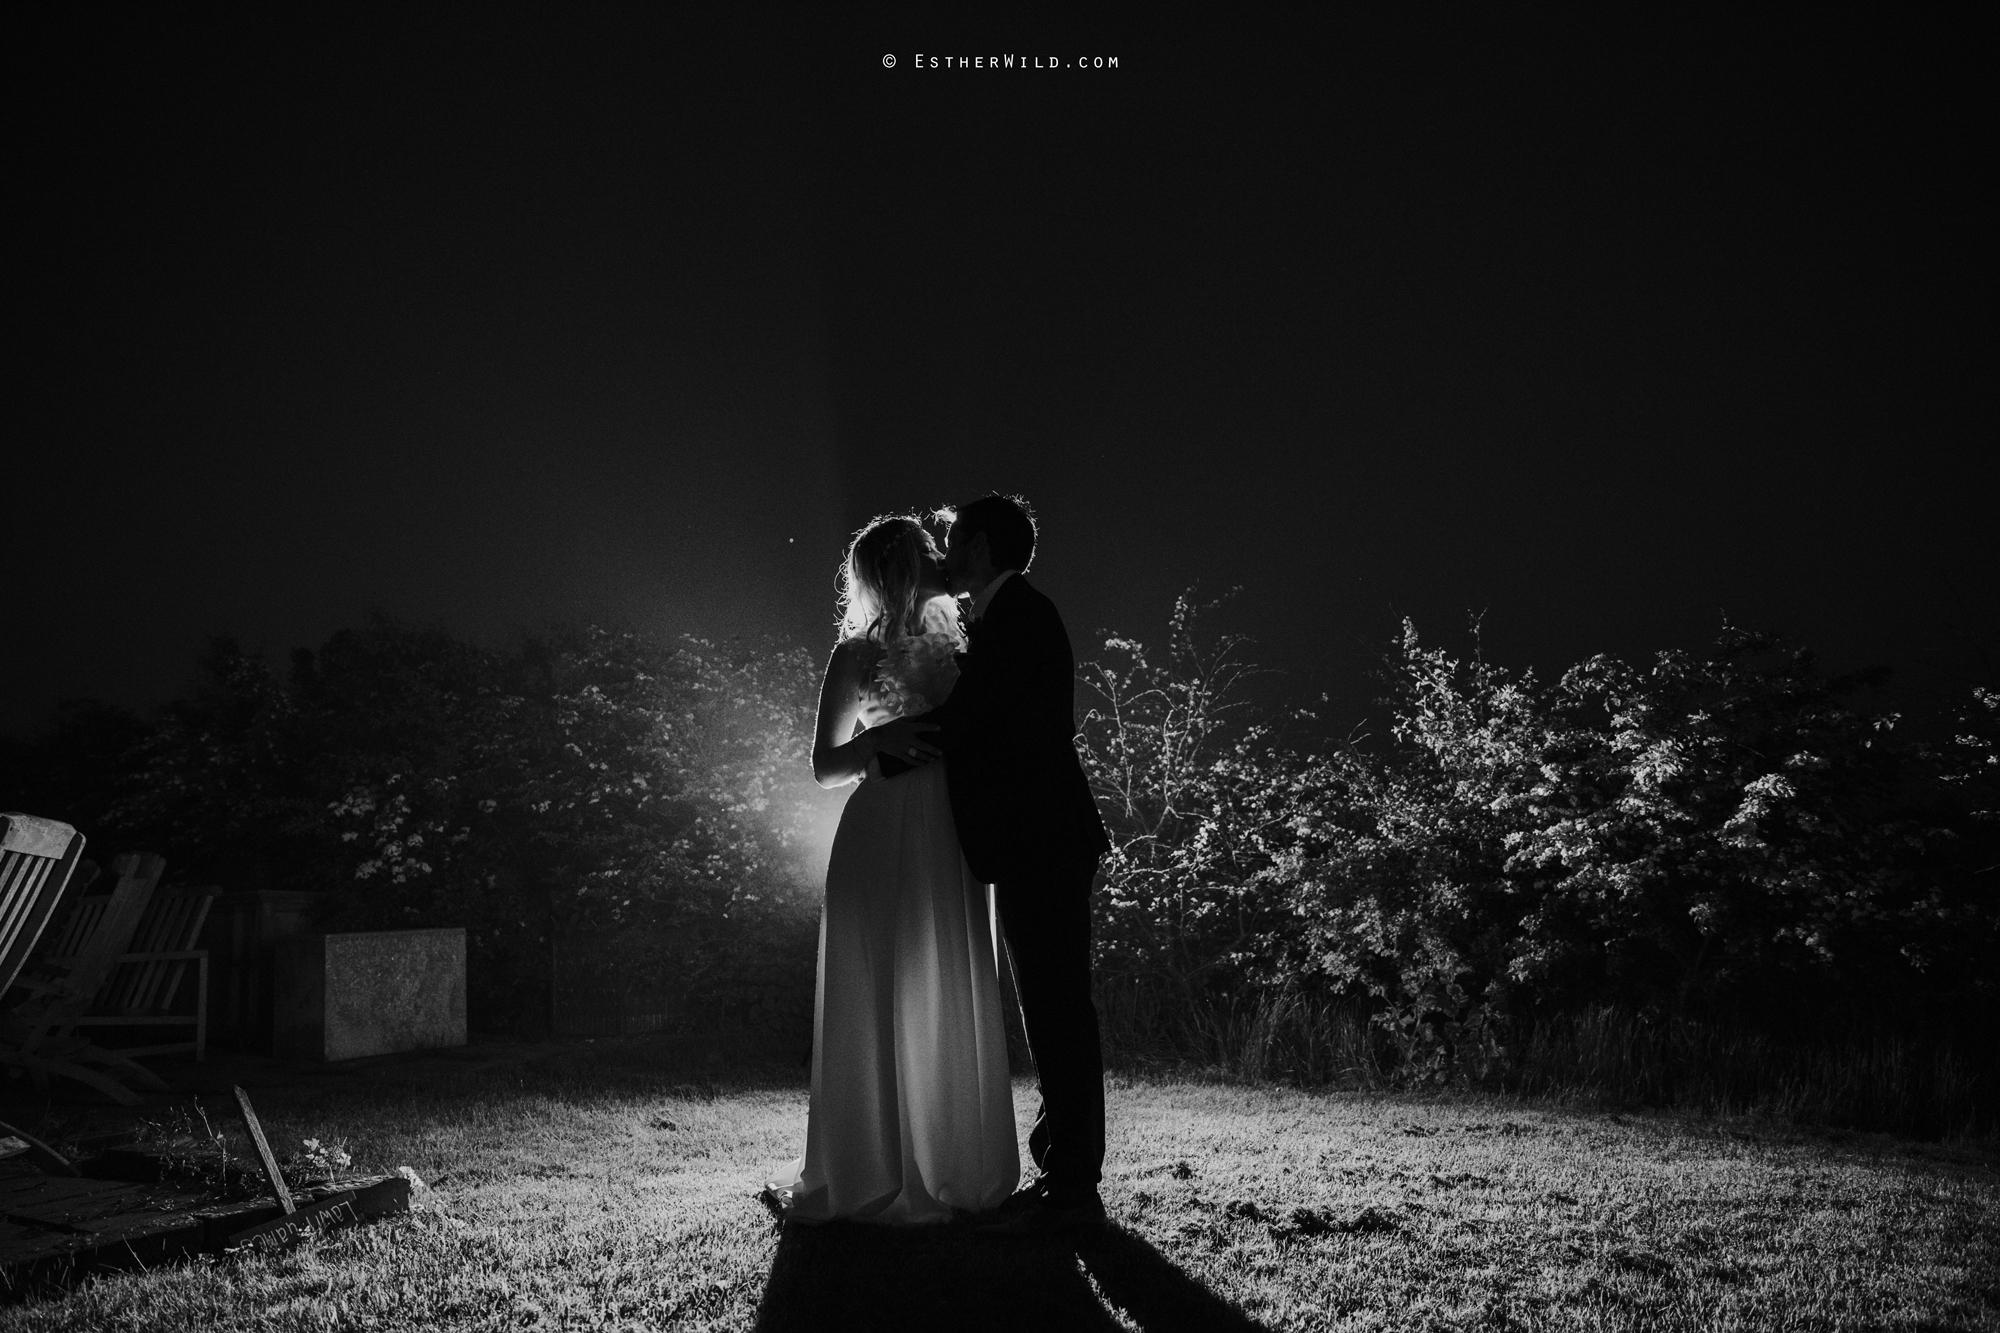 IMG_3299-2Cley_Barn_Drift_Norfolk_Coast_Wedding_Copyright_Esther_Wild_Photographer_.jpg